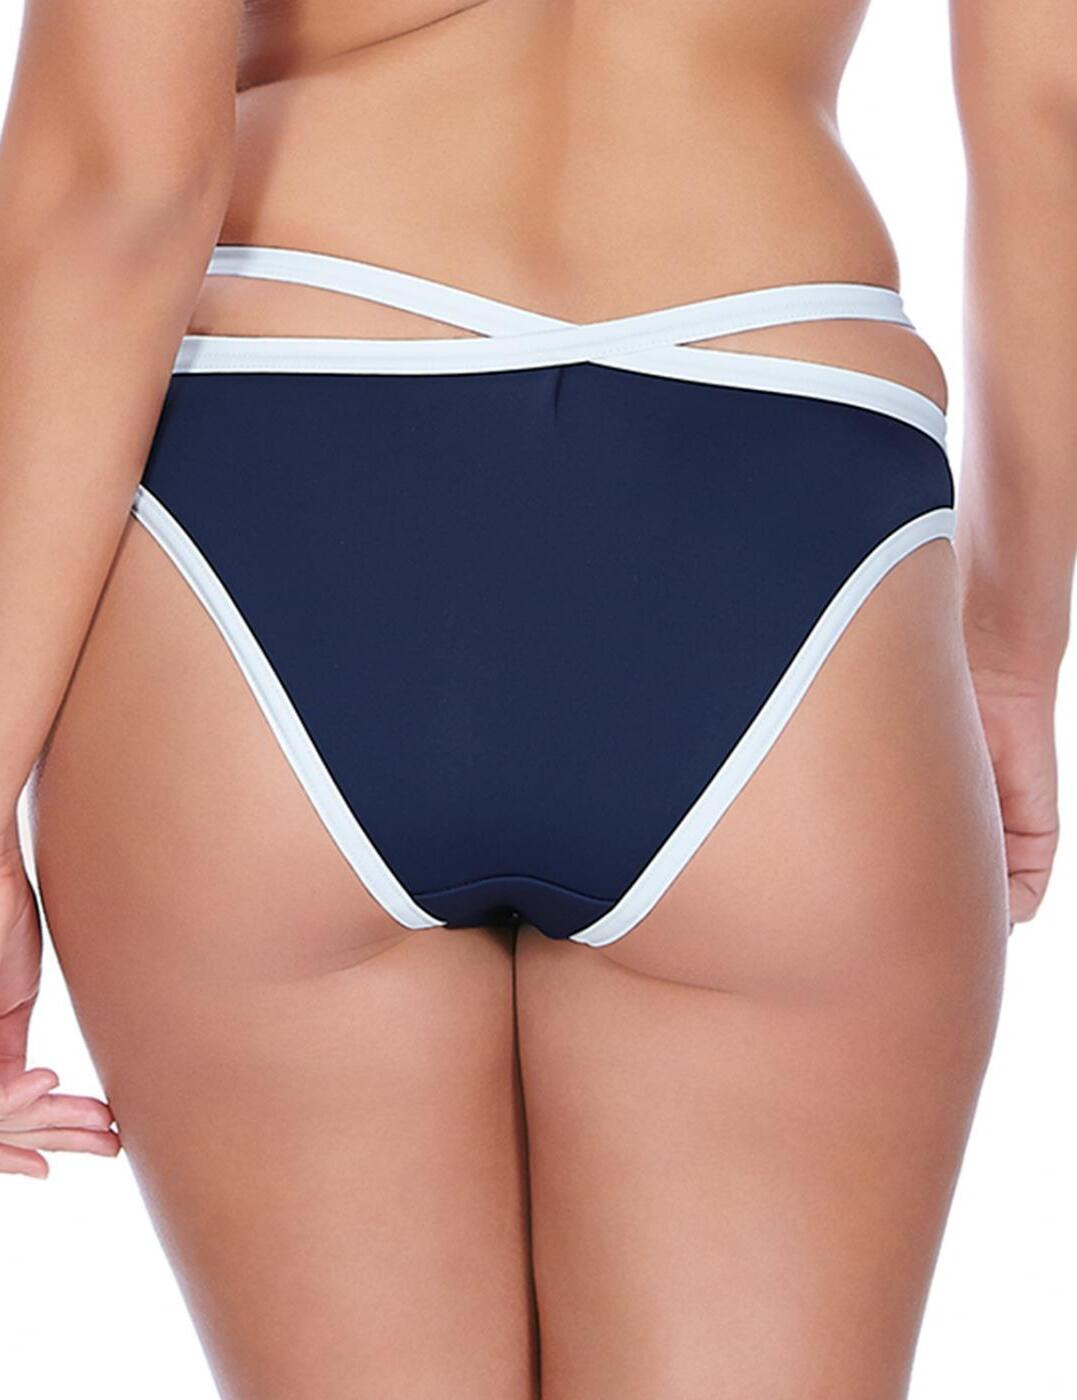 Freya In The Navy Italini Bikini Brief Bottoms 3862 Marine Blue